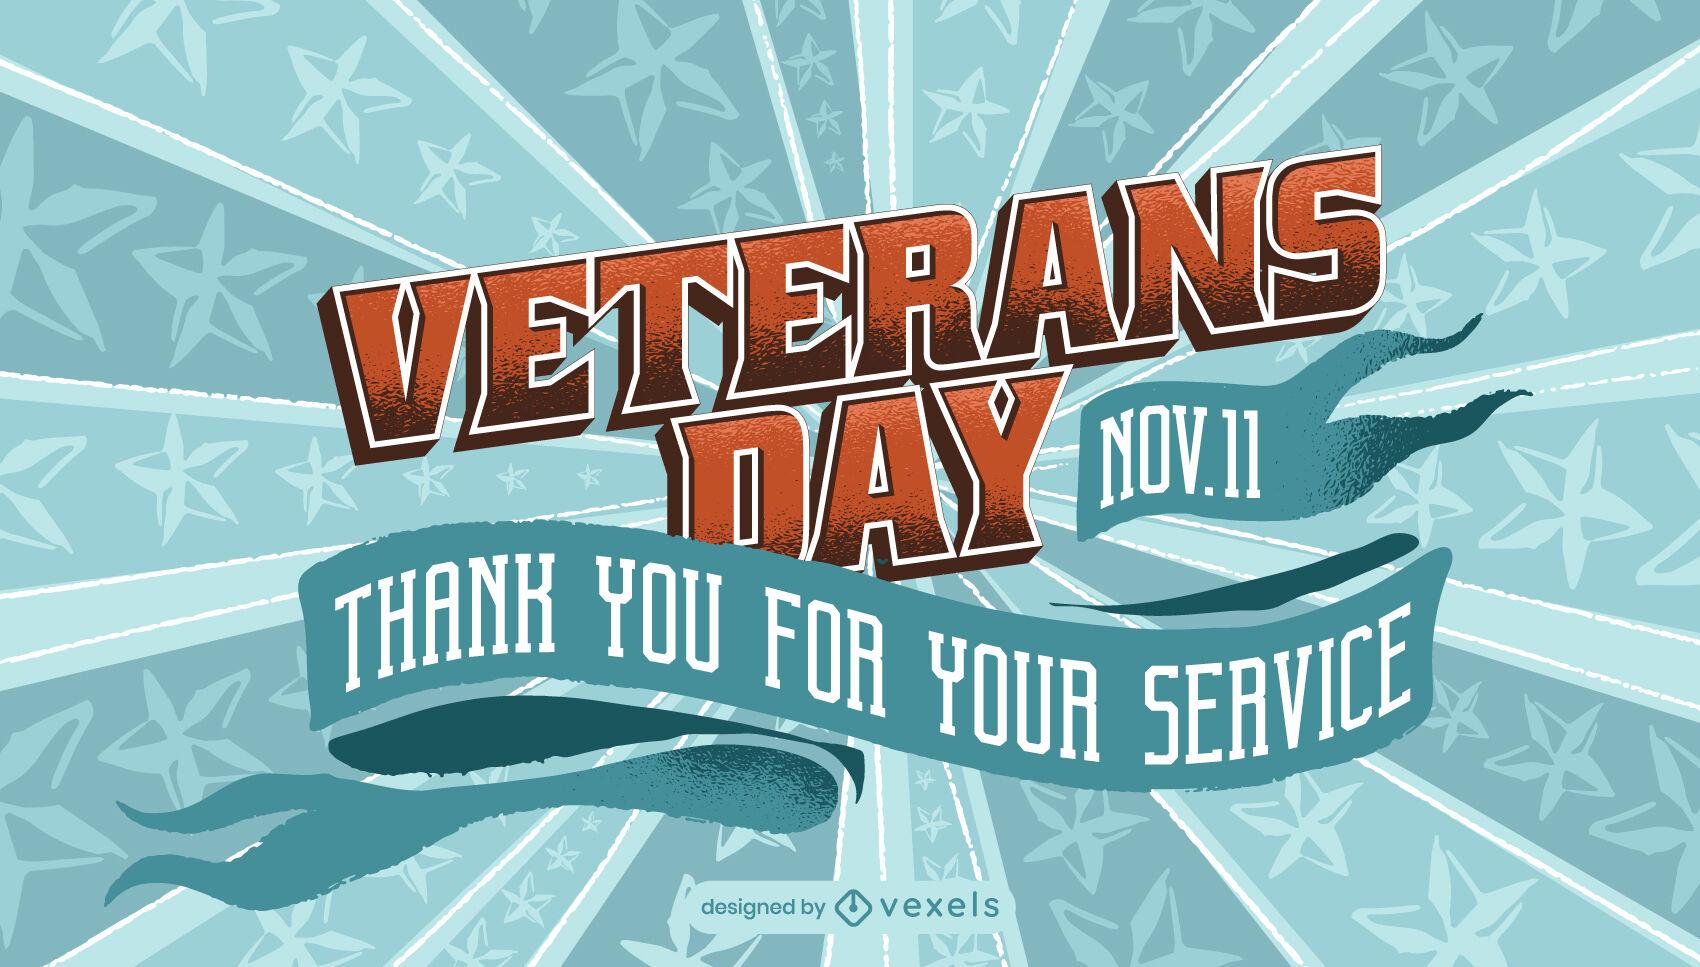 Veterans day american holiday slider